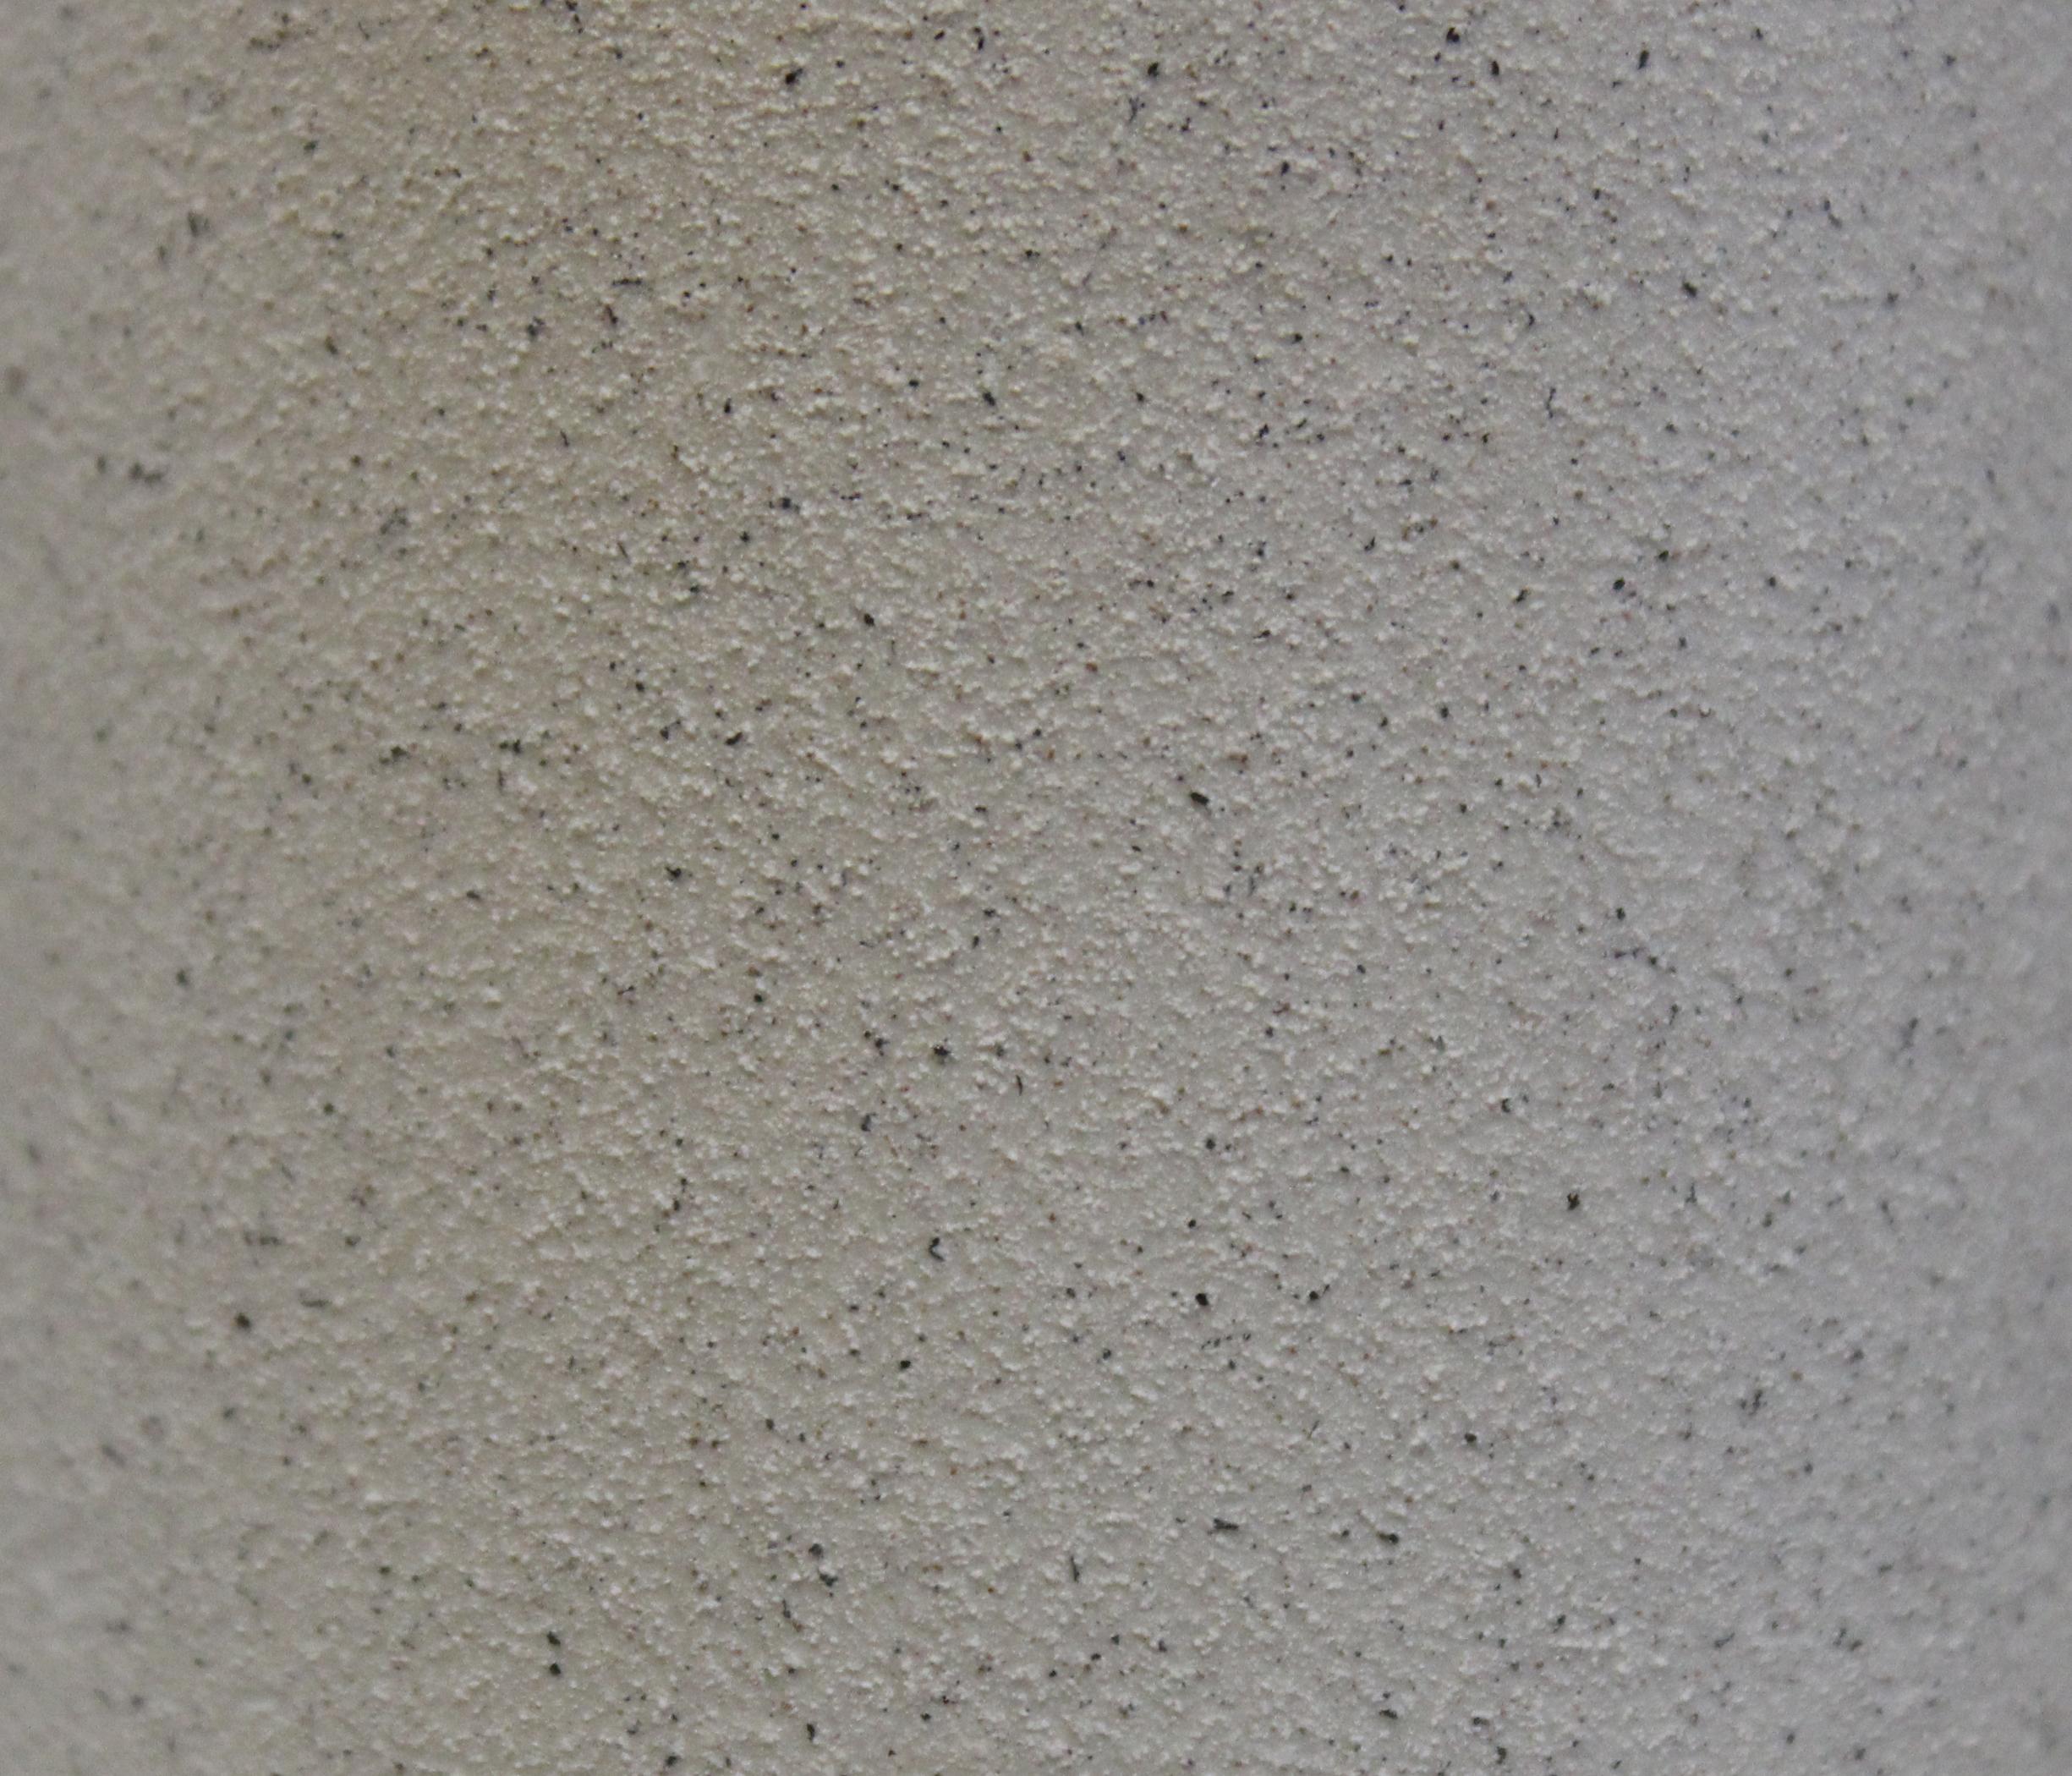 Textured Caribbean Sand